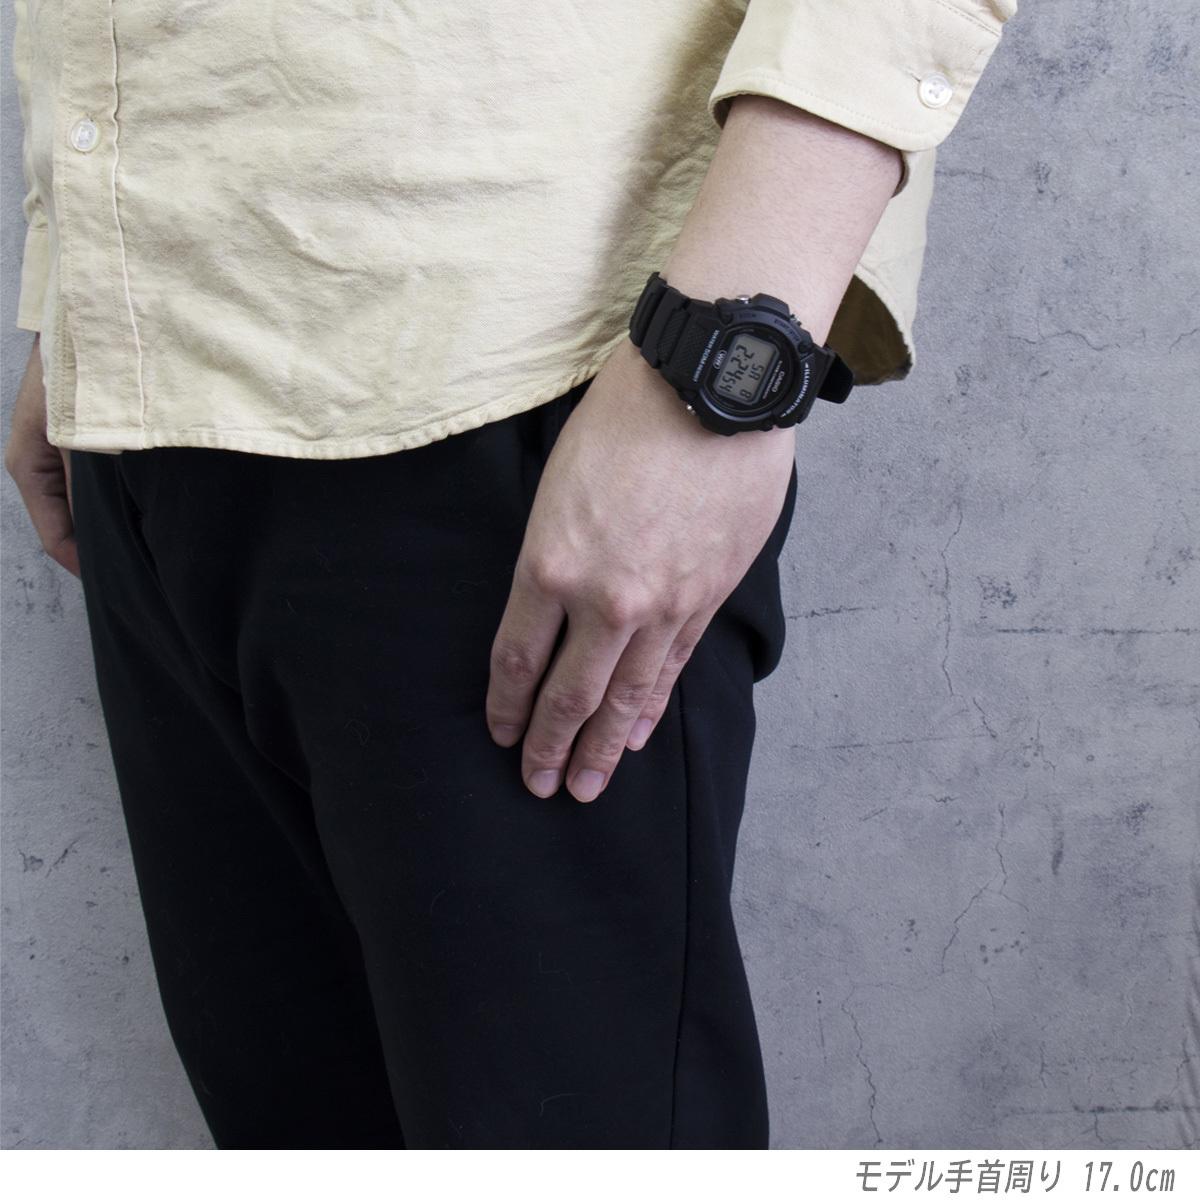 CASIO カシオ 防水 ユニセックス デジタル W219-1A ブラック シンプル メンズ レディース キッズ チープカシオ 男性 女性 子供 腕時計_画像3